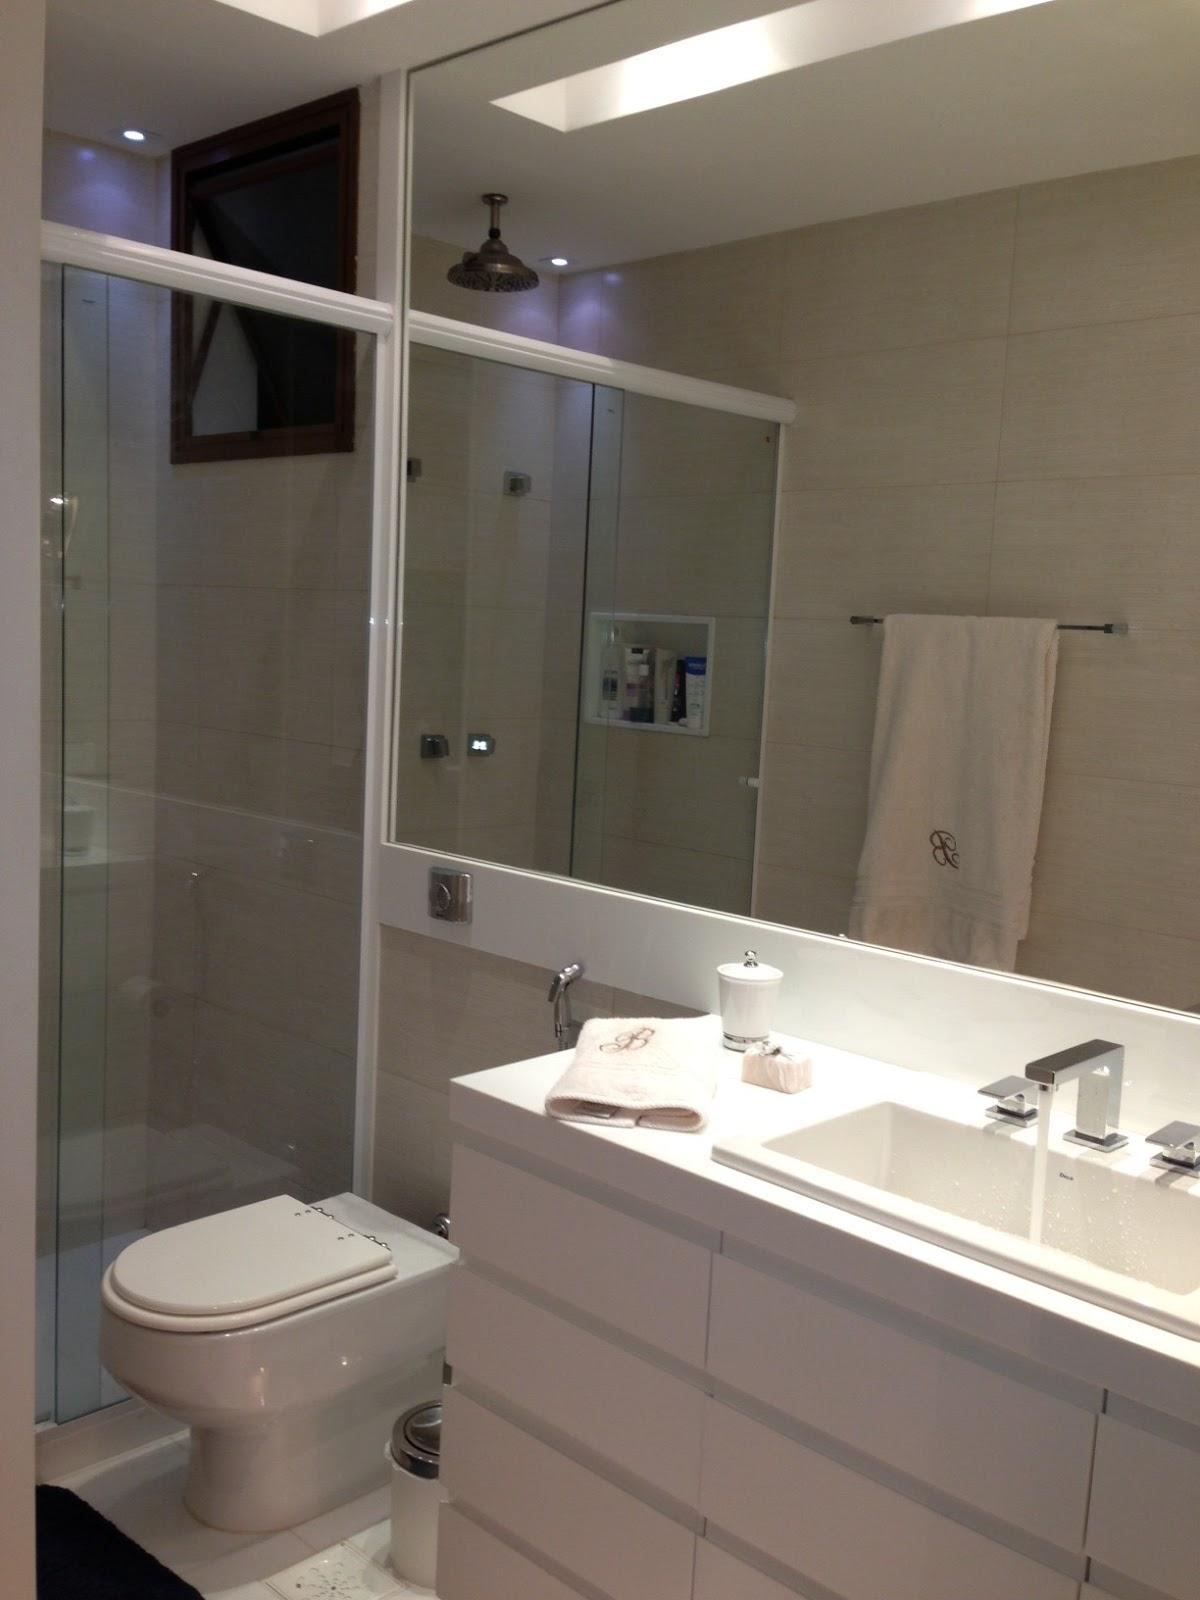 FCL.interiores: Banheiro bege e branco #80704B 1200x1600 Banheiro Branco E Marron